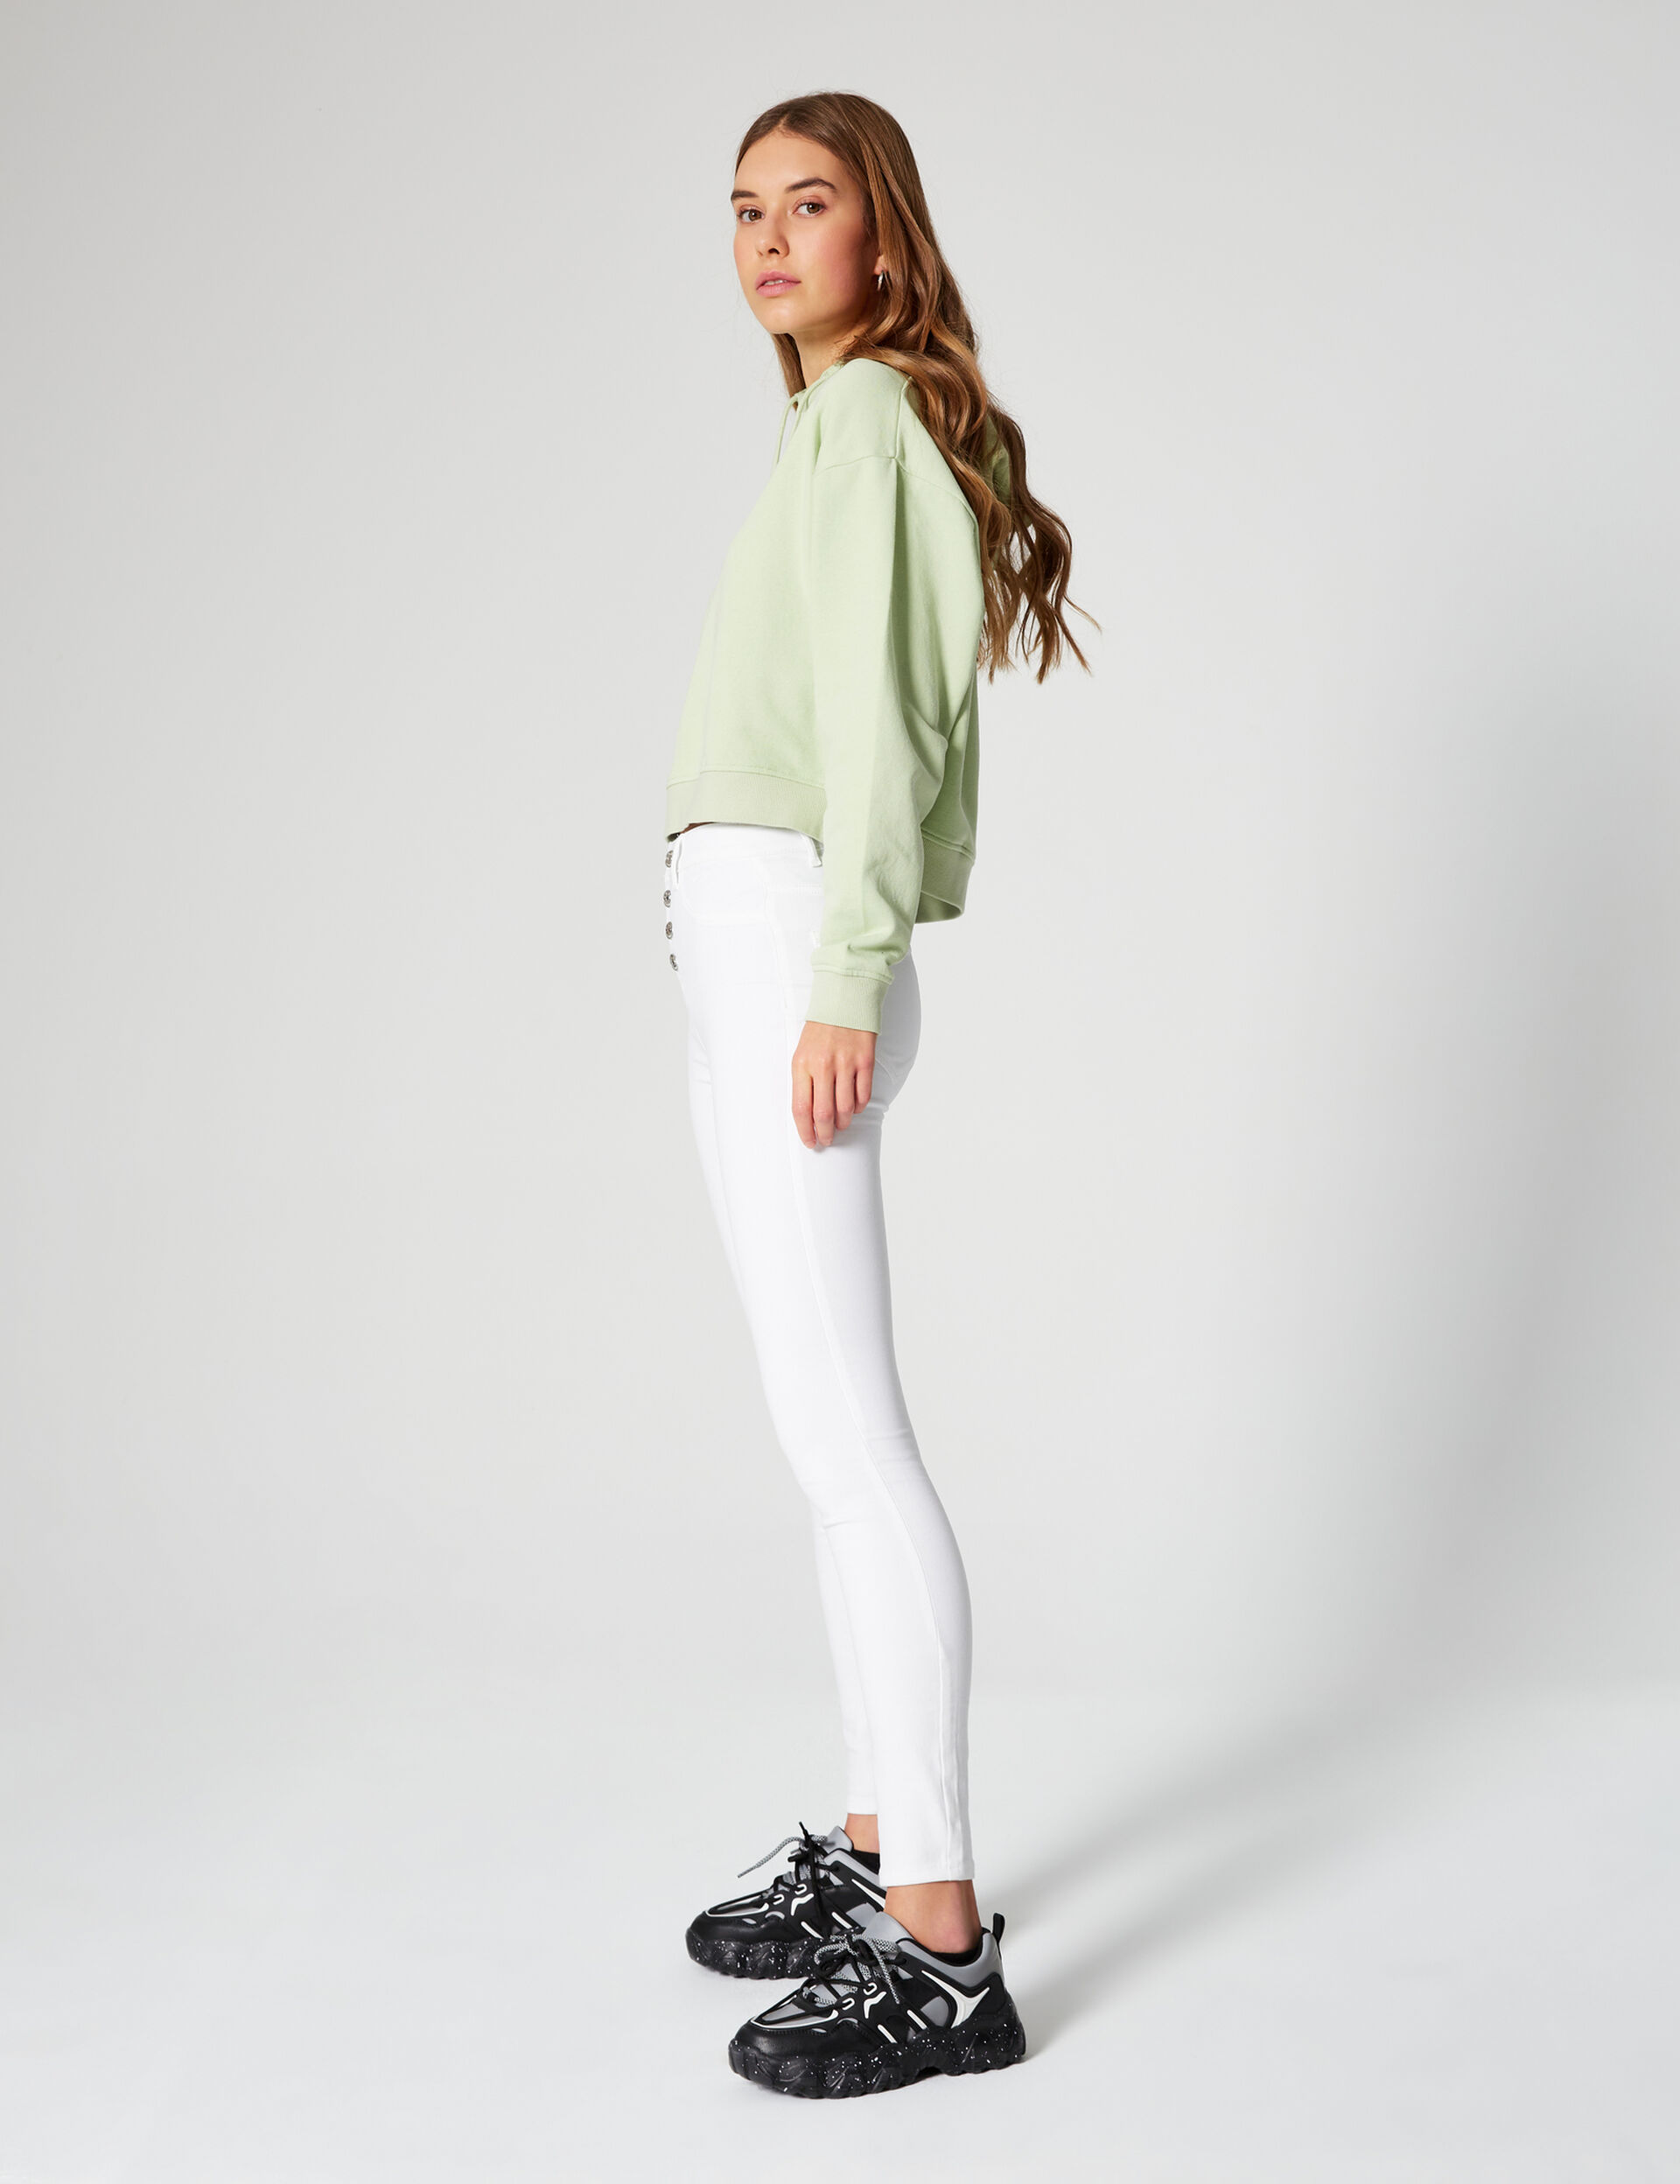 High waist jeggings